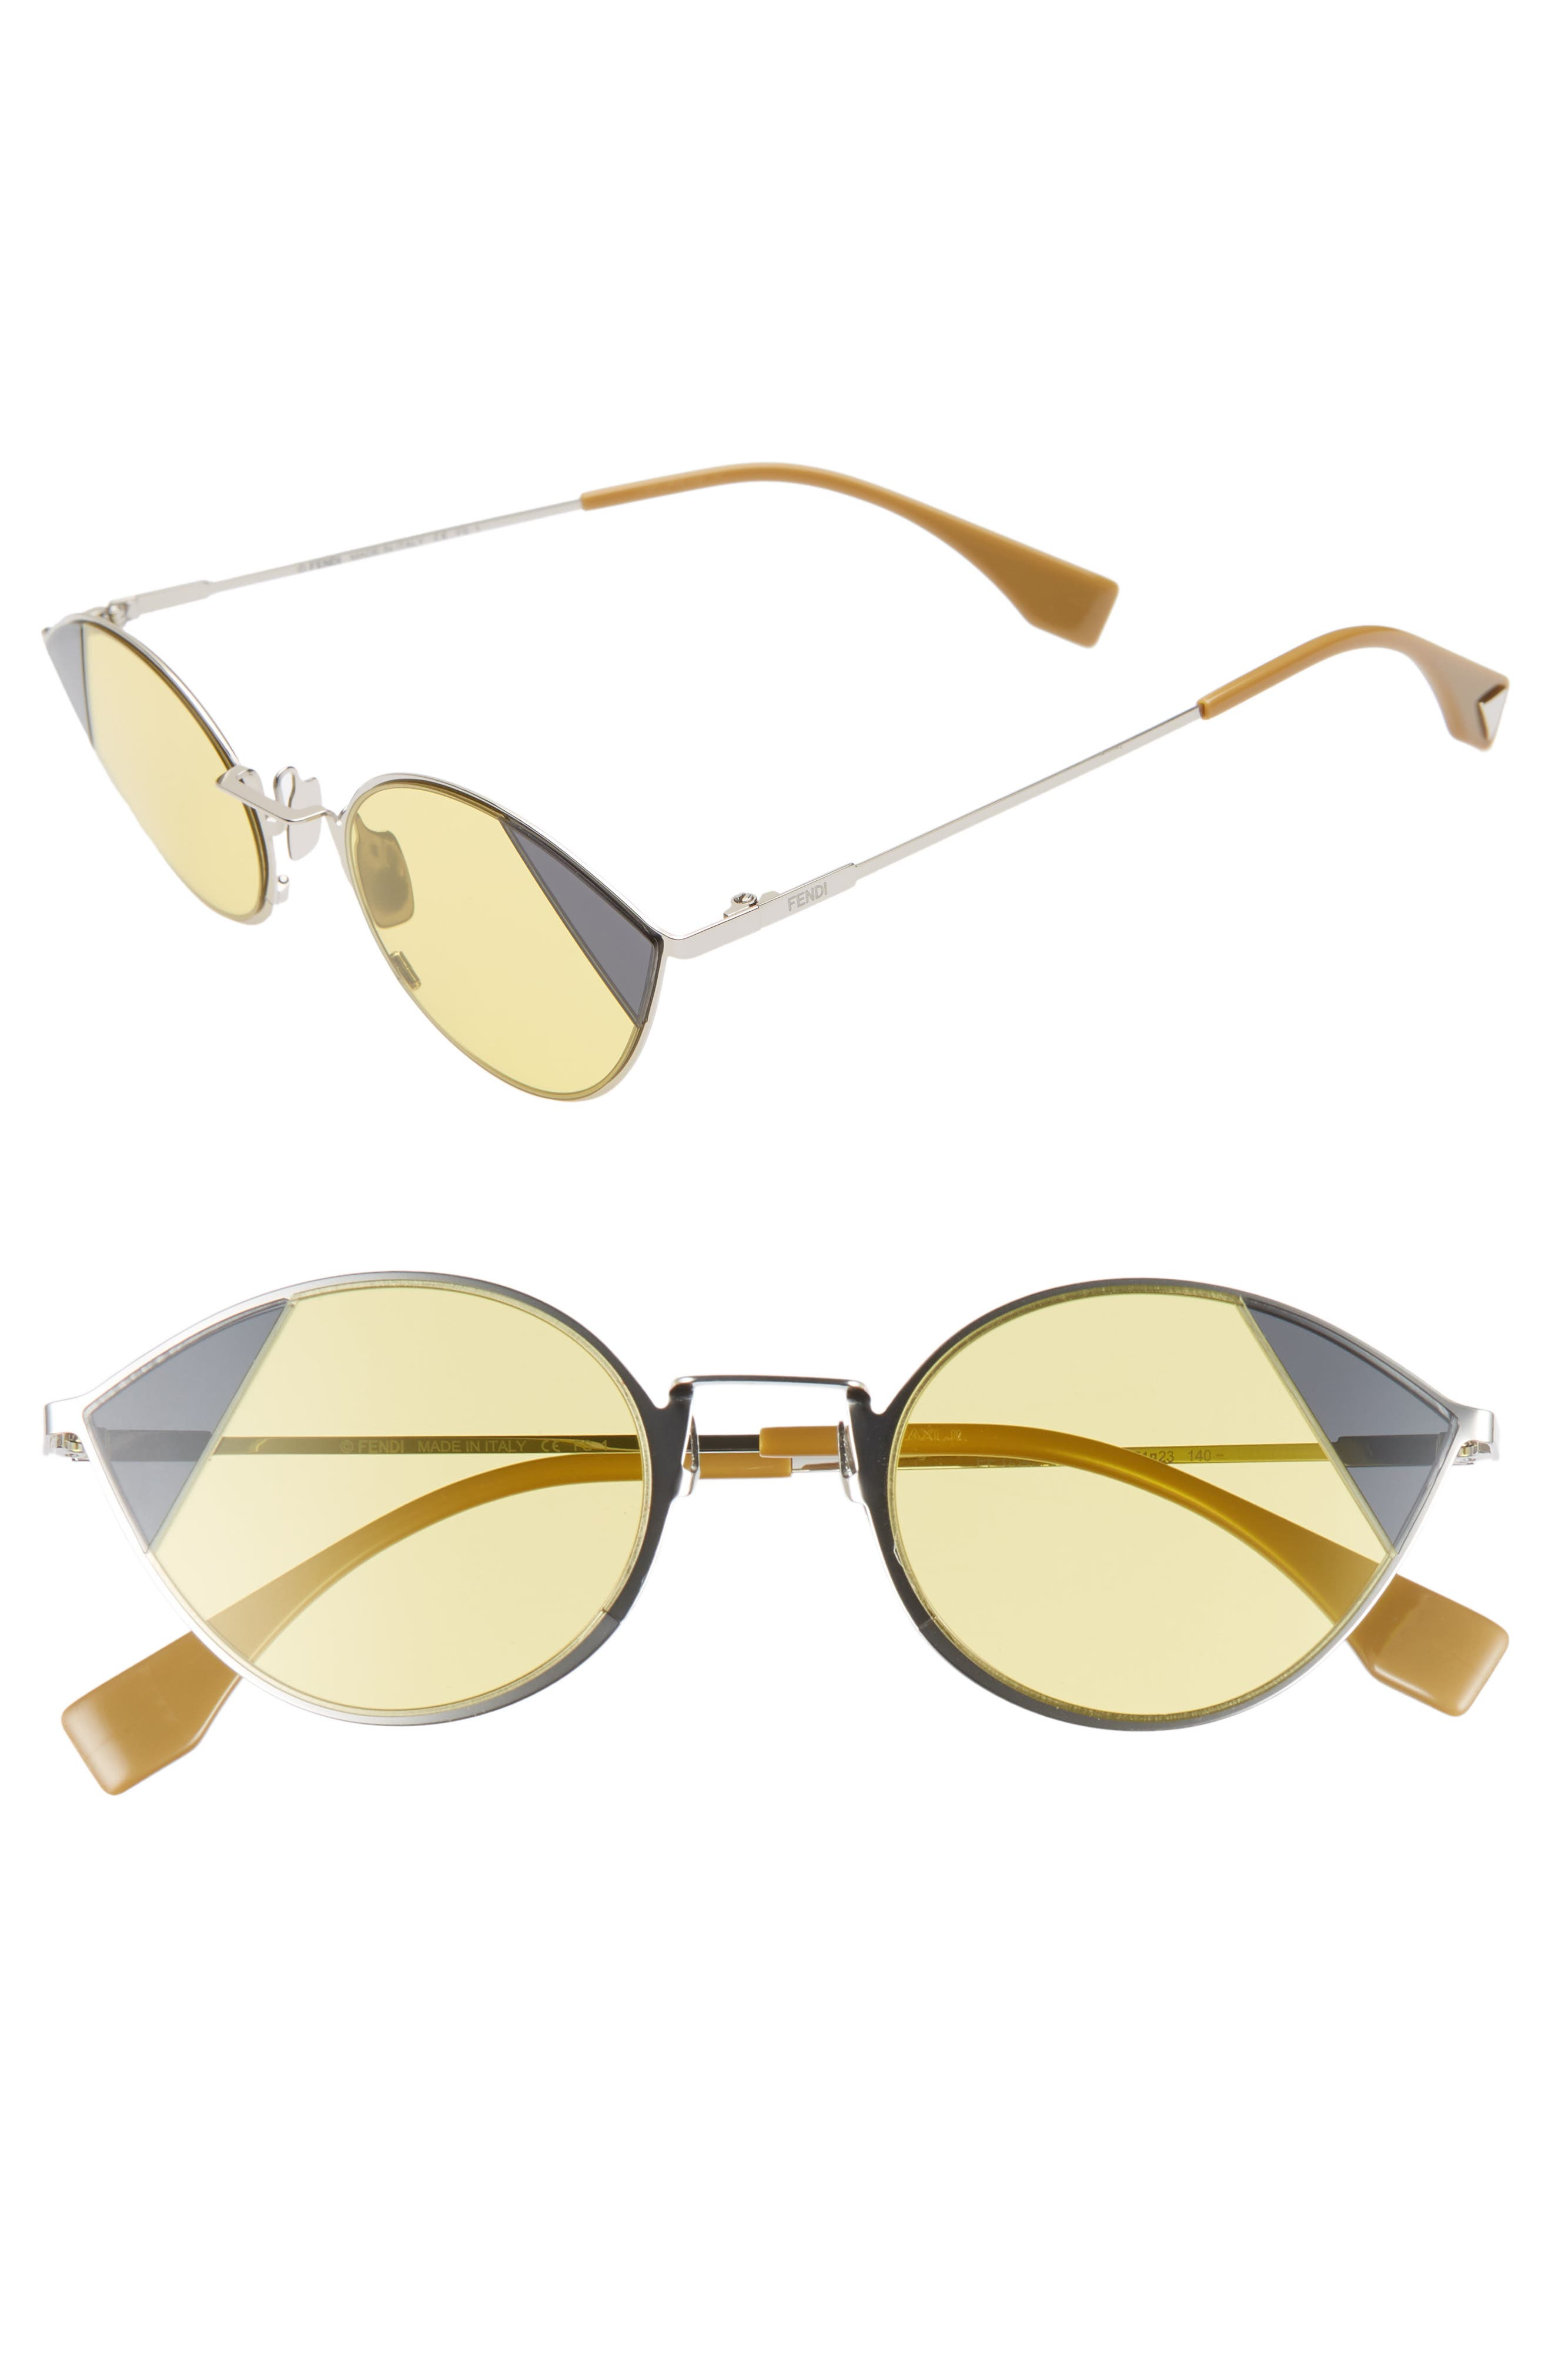 51Mm Aviator Sunglasses - Silver/ Gold